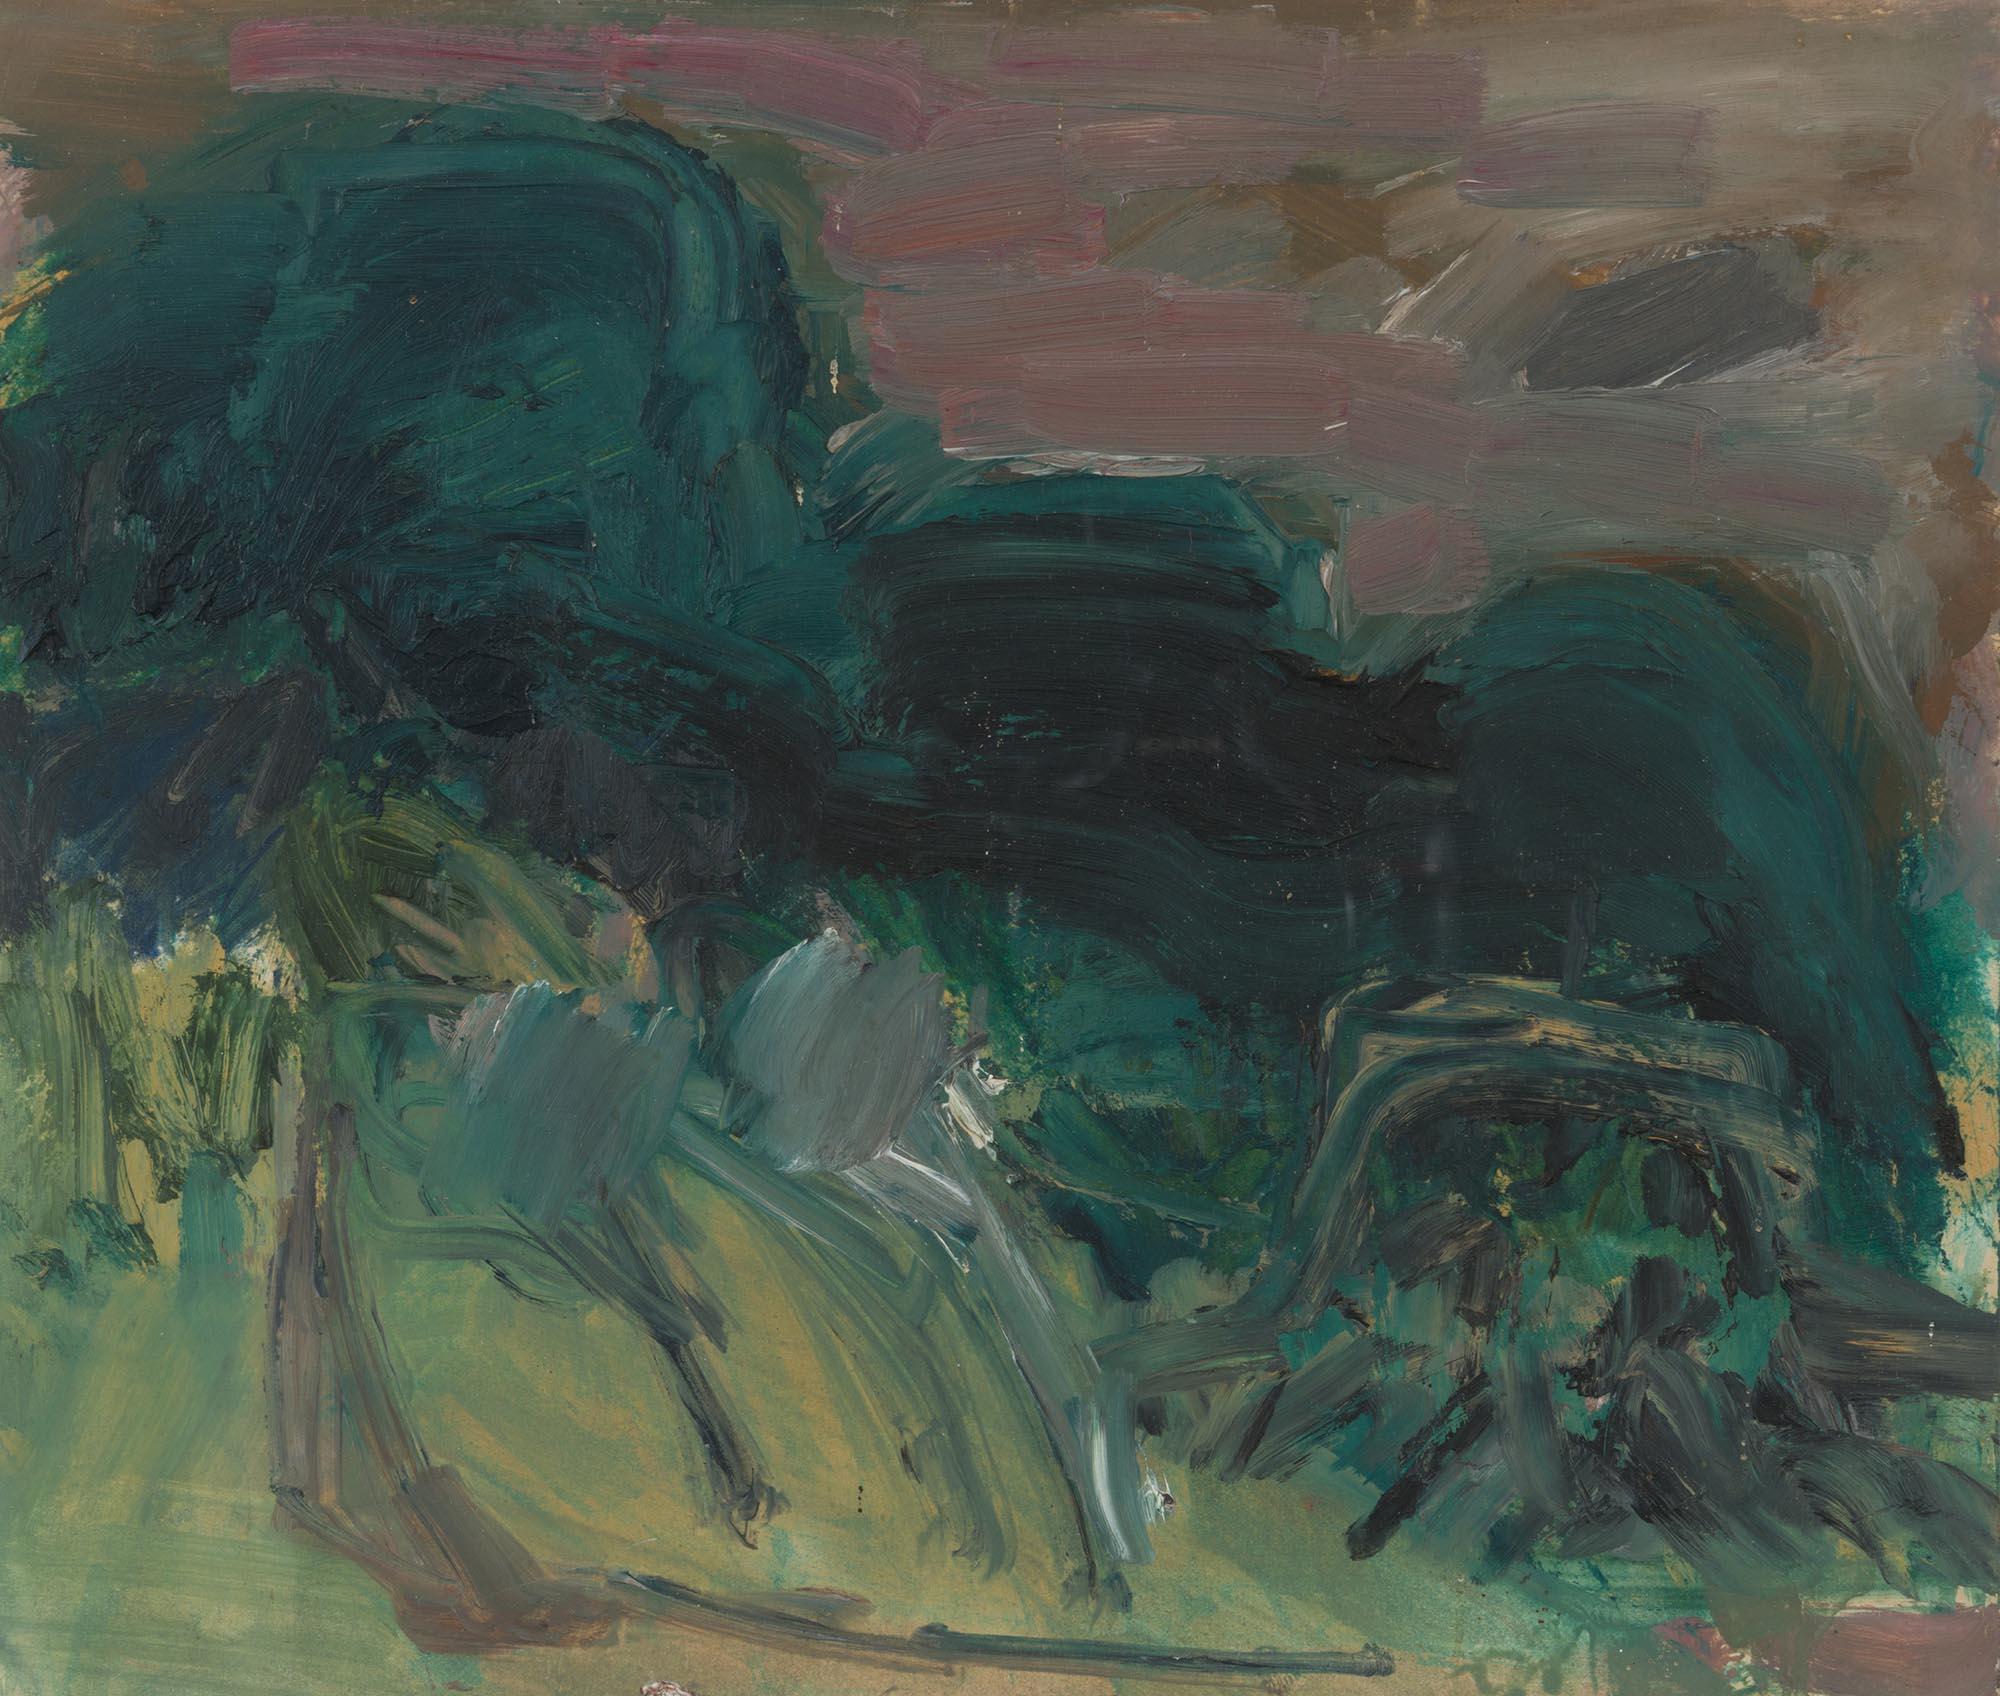 "Lot 7 - Basil Blackshaw HRHA HRUA 1932-2016 WOODED LANDSCAPE Oil on board, 10 1/4"" x 12"" (26 x 30.5 cm),"